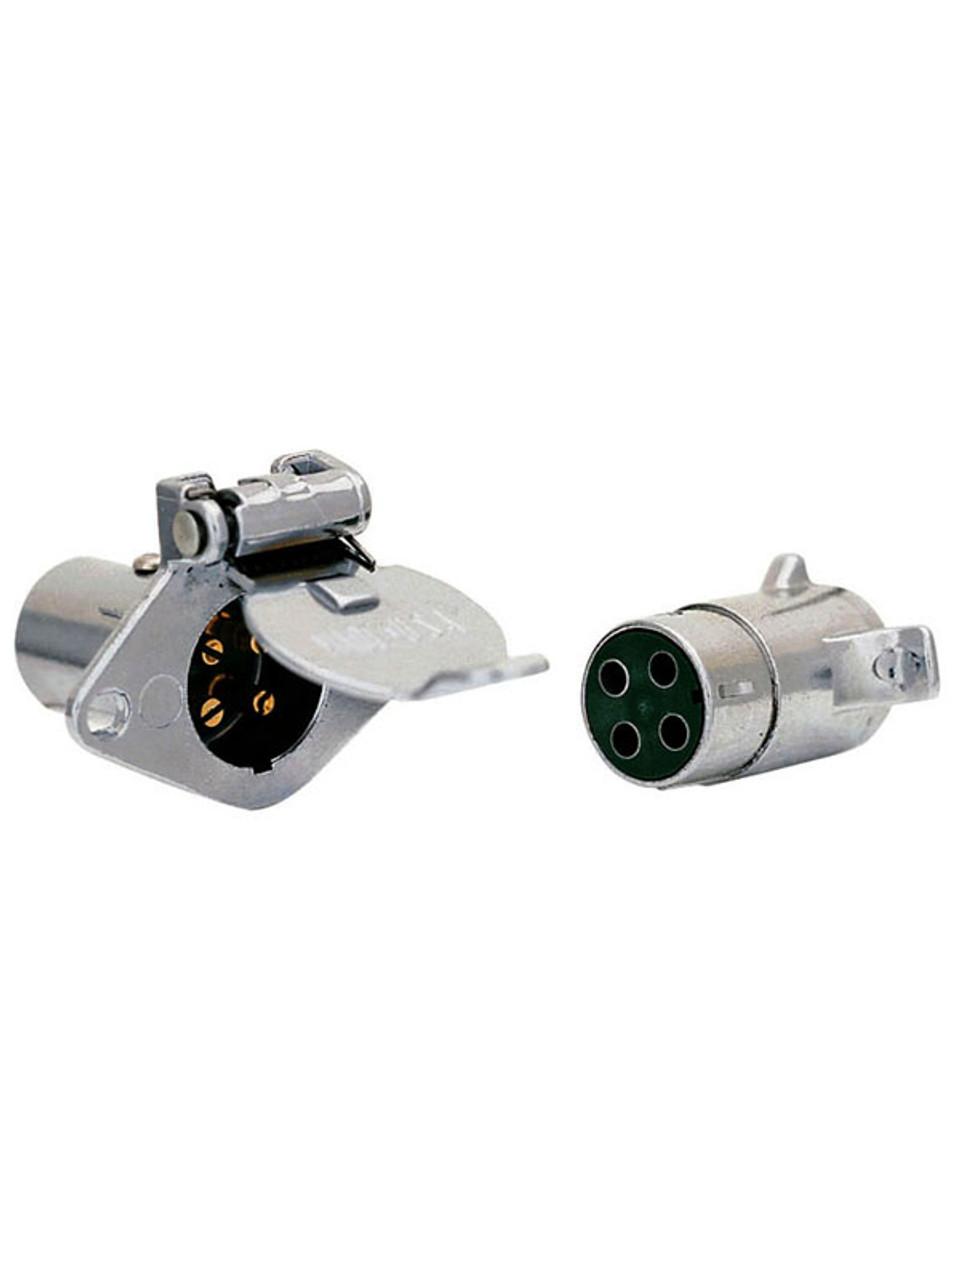 215 --- 4-Way Round Chrome Socket and Plug